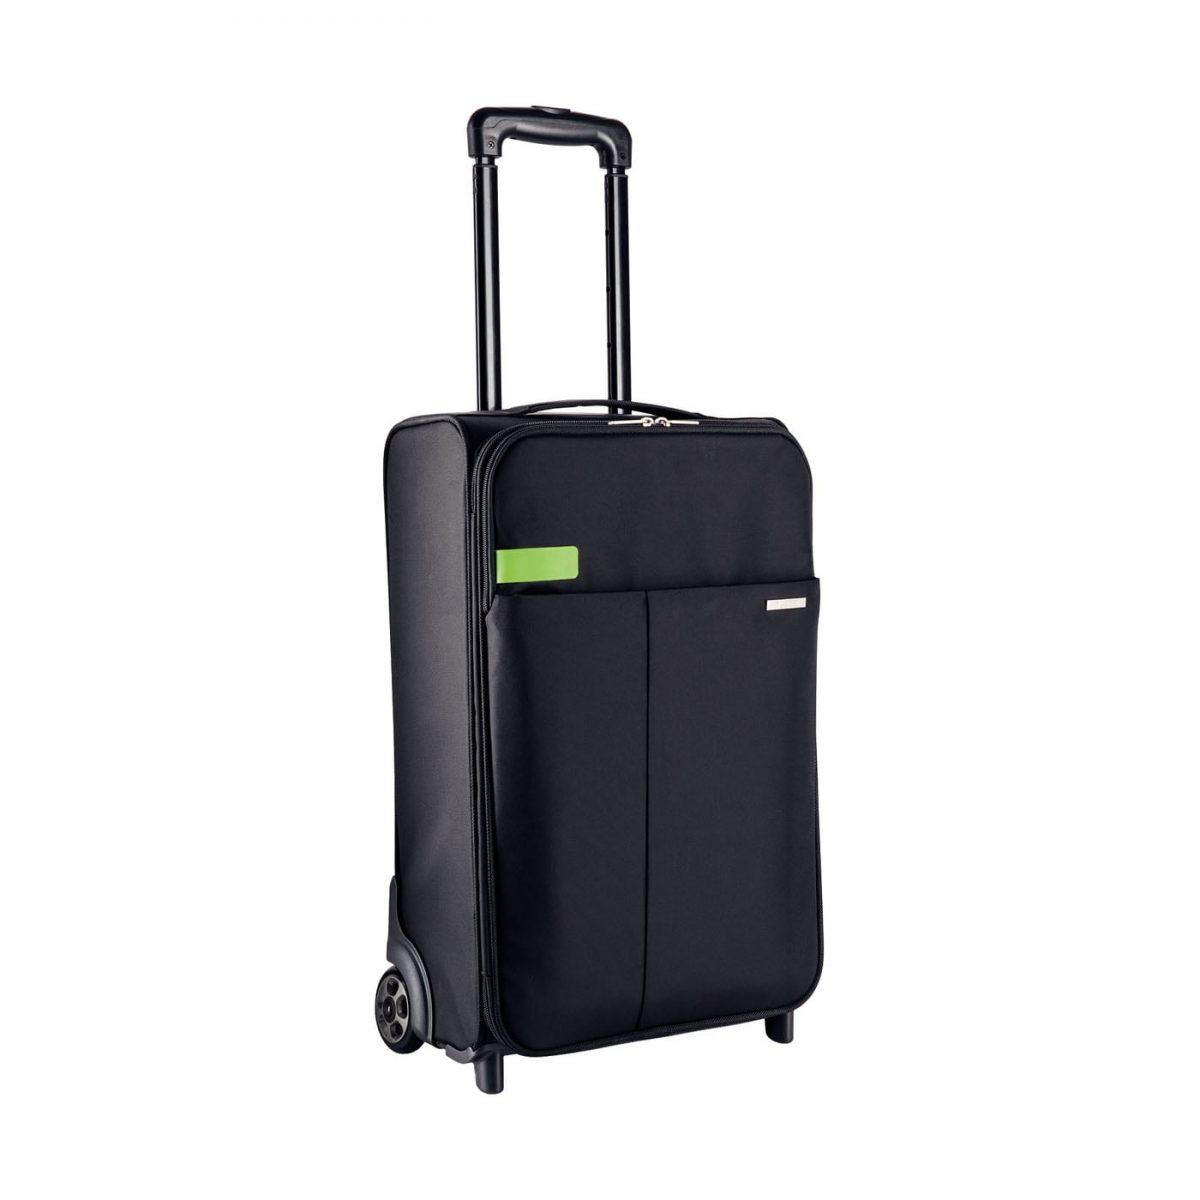 Geanta LEITZ Complete de mana cu 2 rotile Smart Traveller - negru